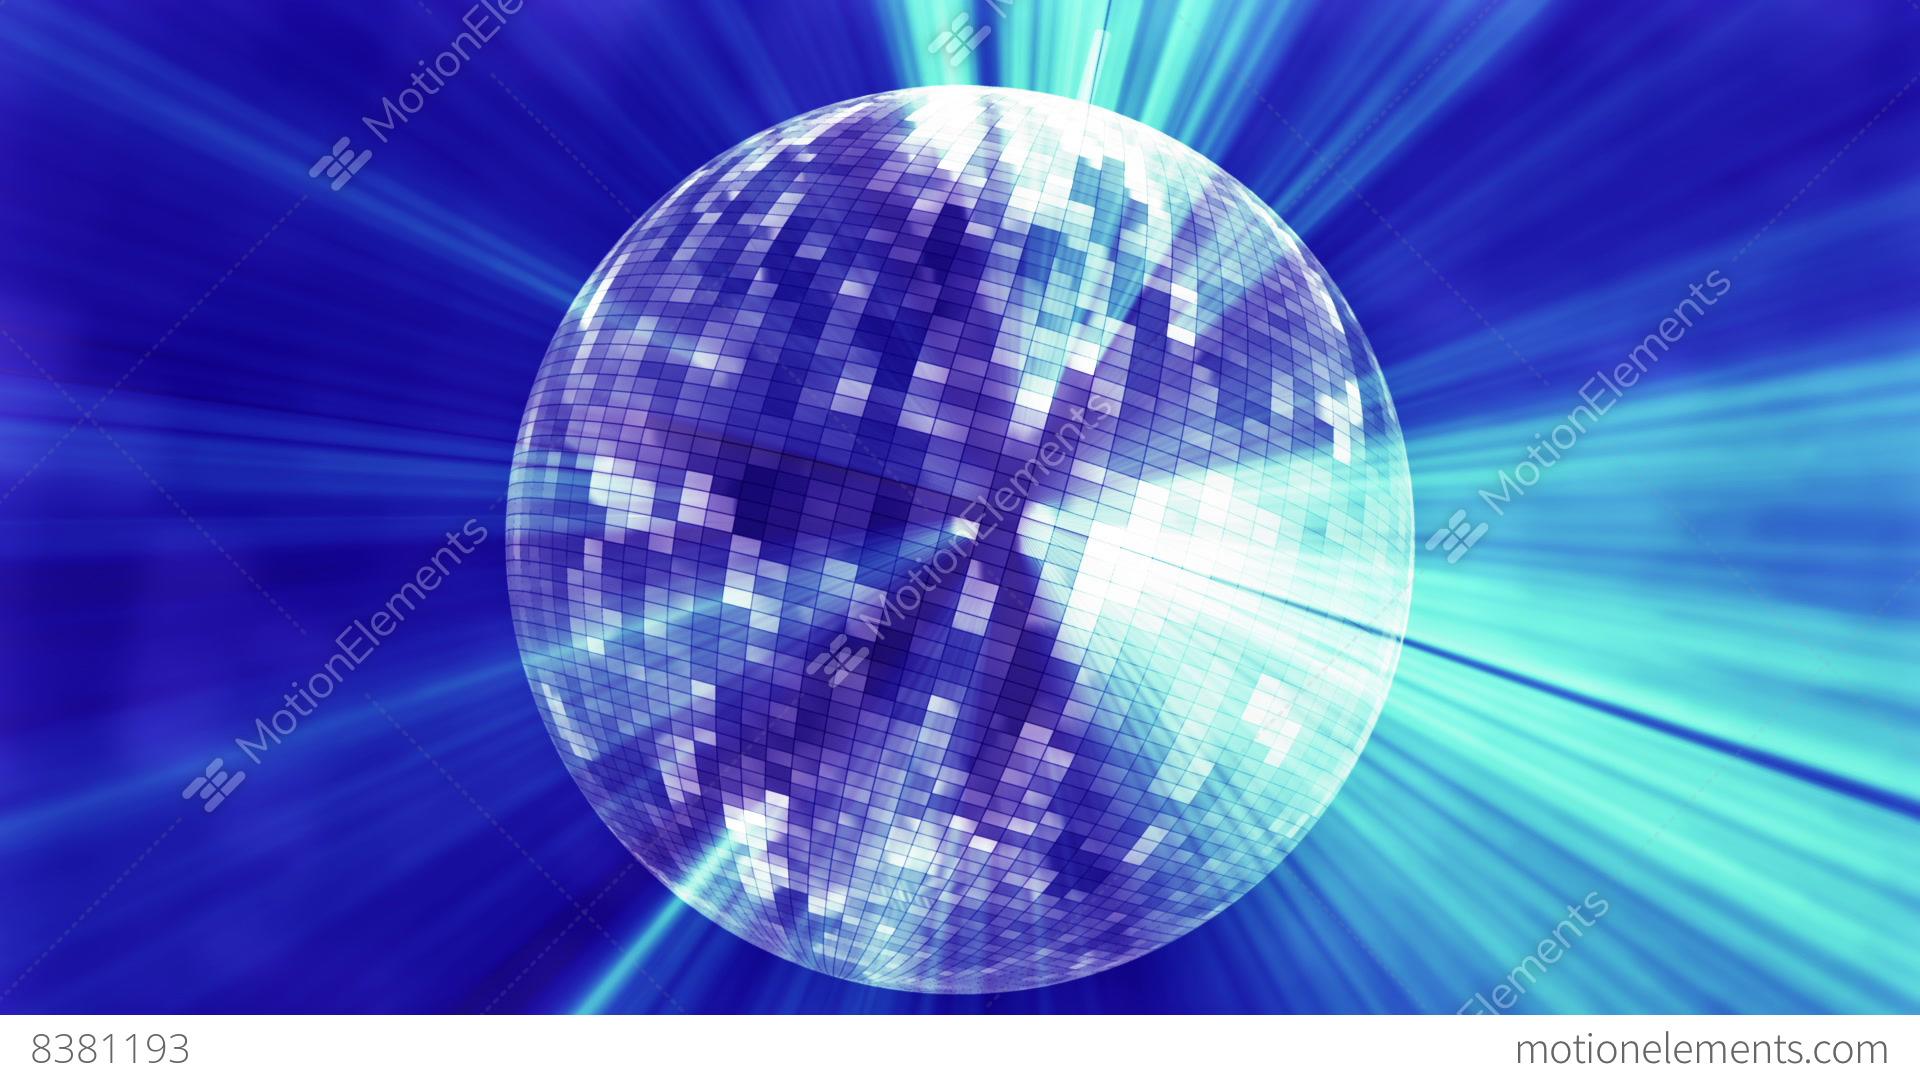 Cg Funky Disco Mirror Ball With Light Rays V1 Stock